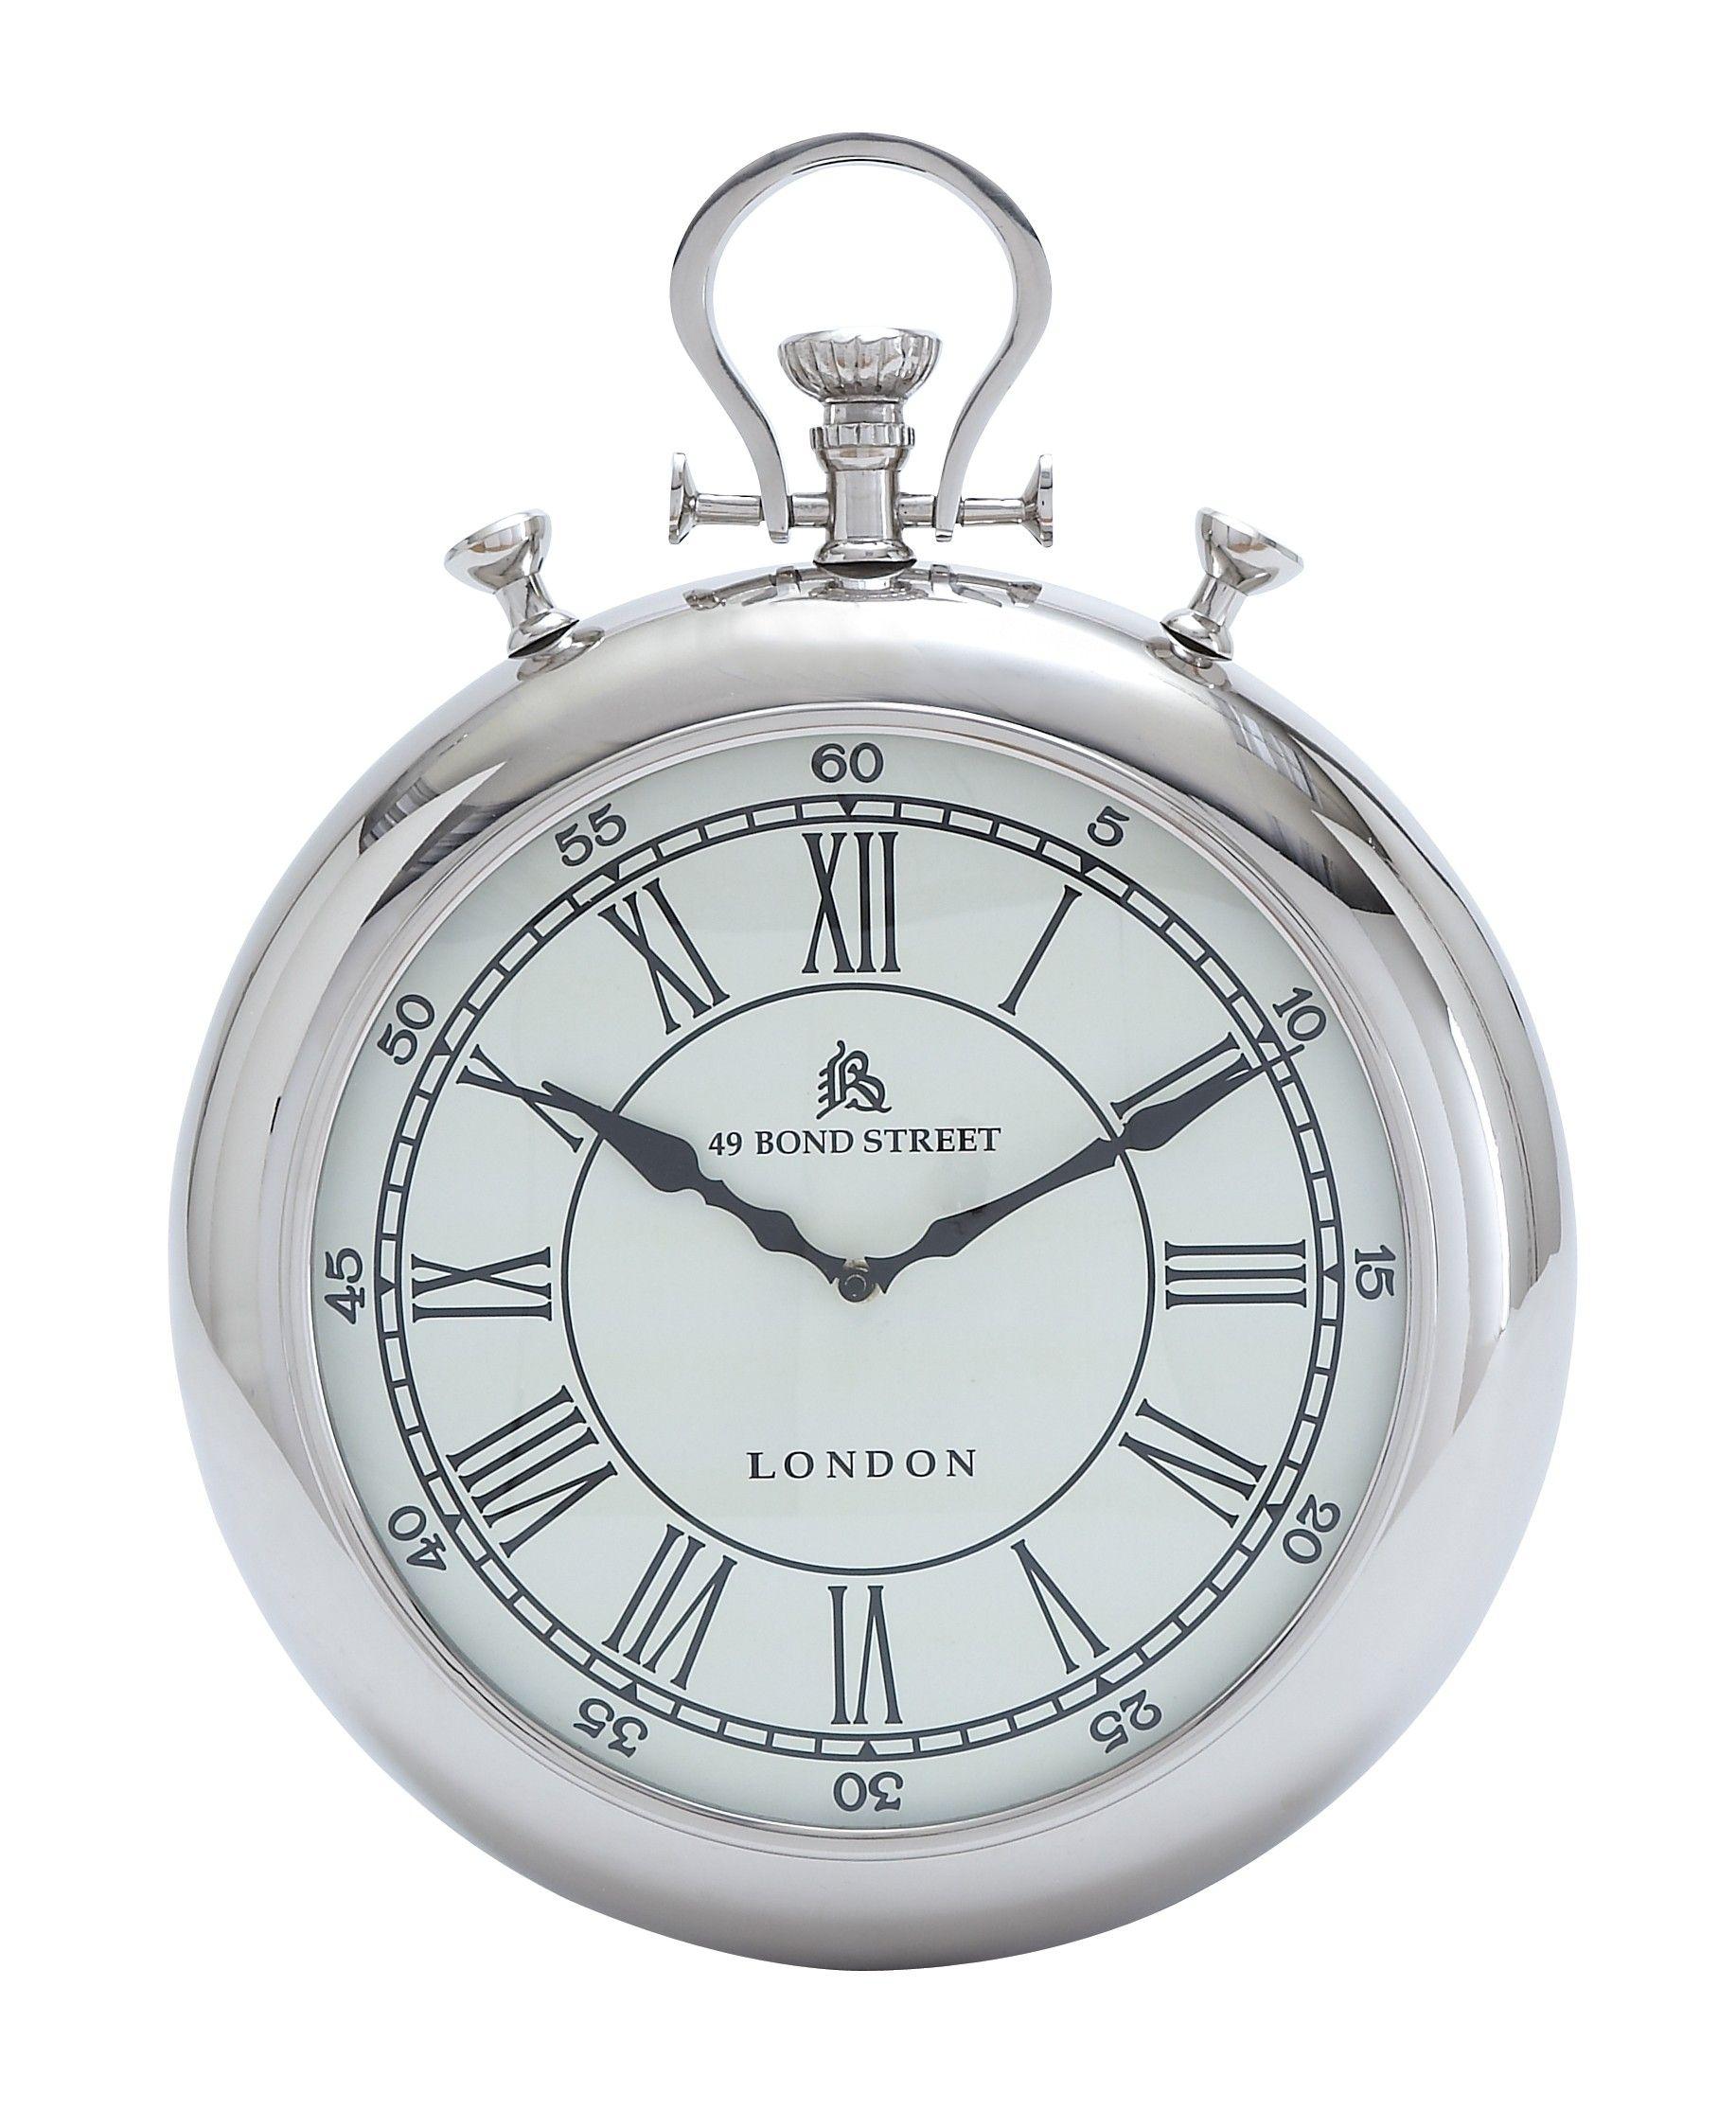 pocket watch design silver chrome finish wall clock accent on wall clocks id=78755